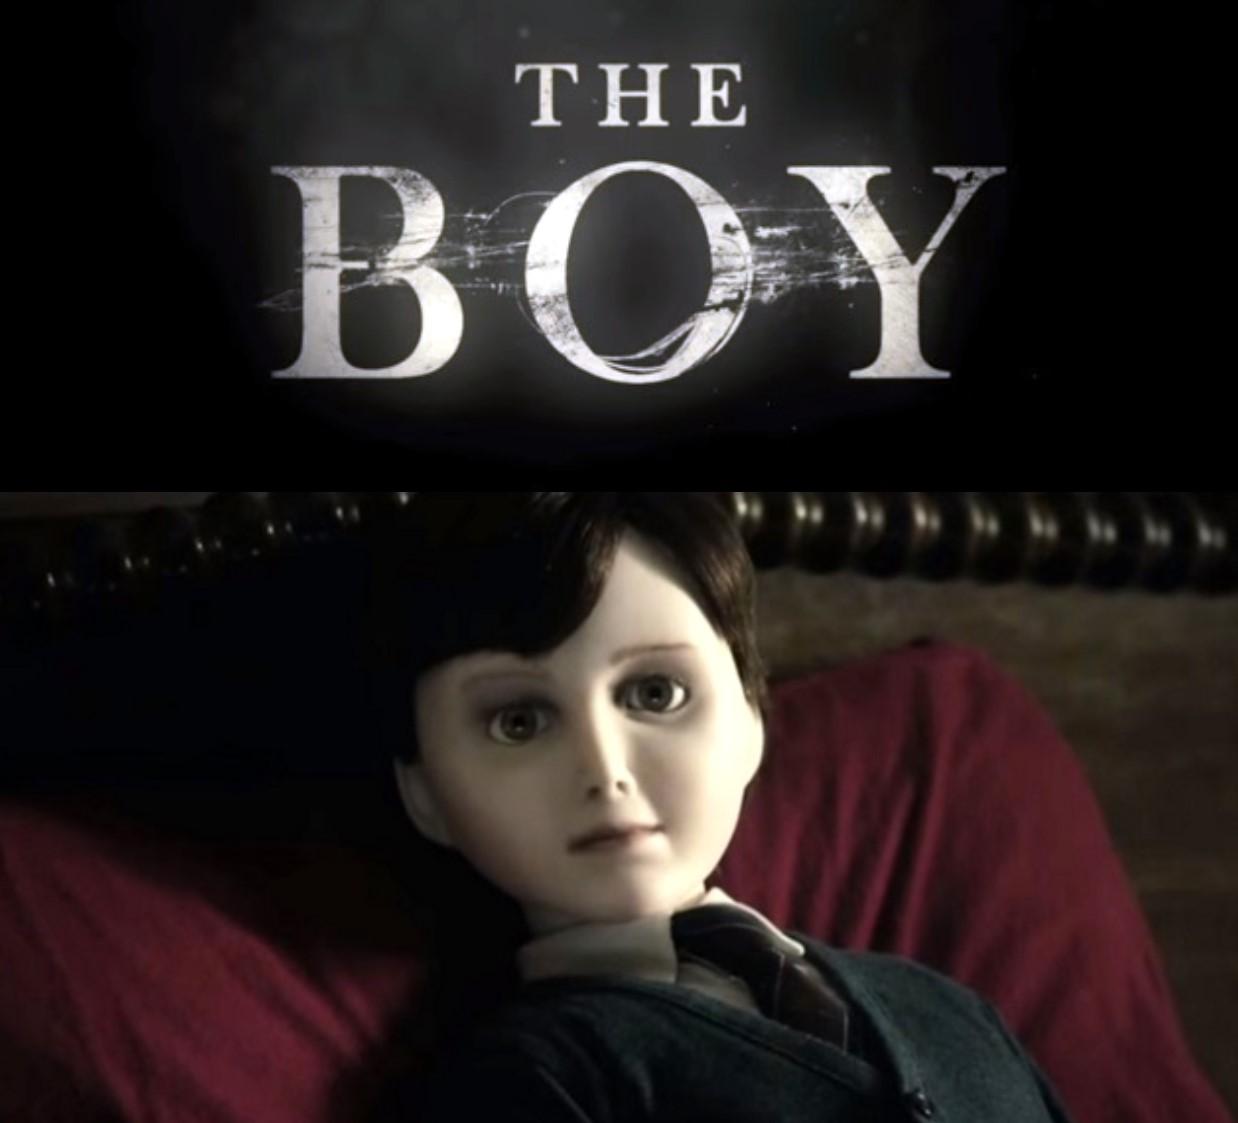 theboy.jpeg